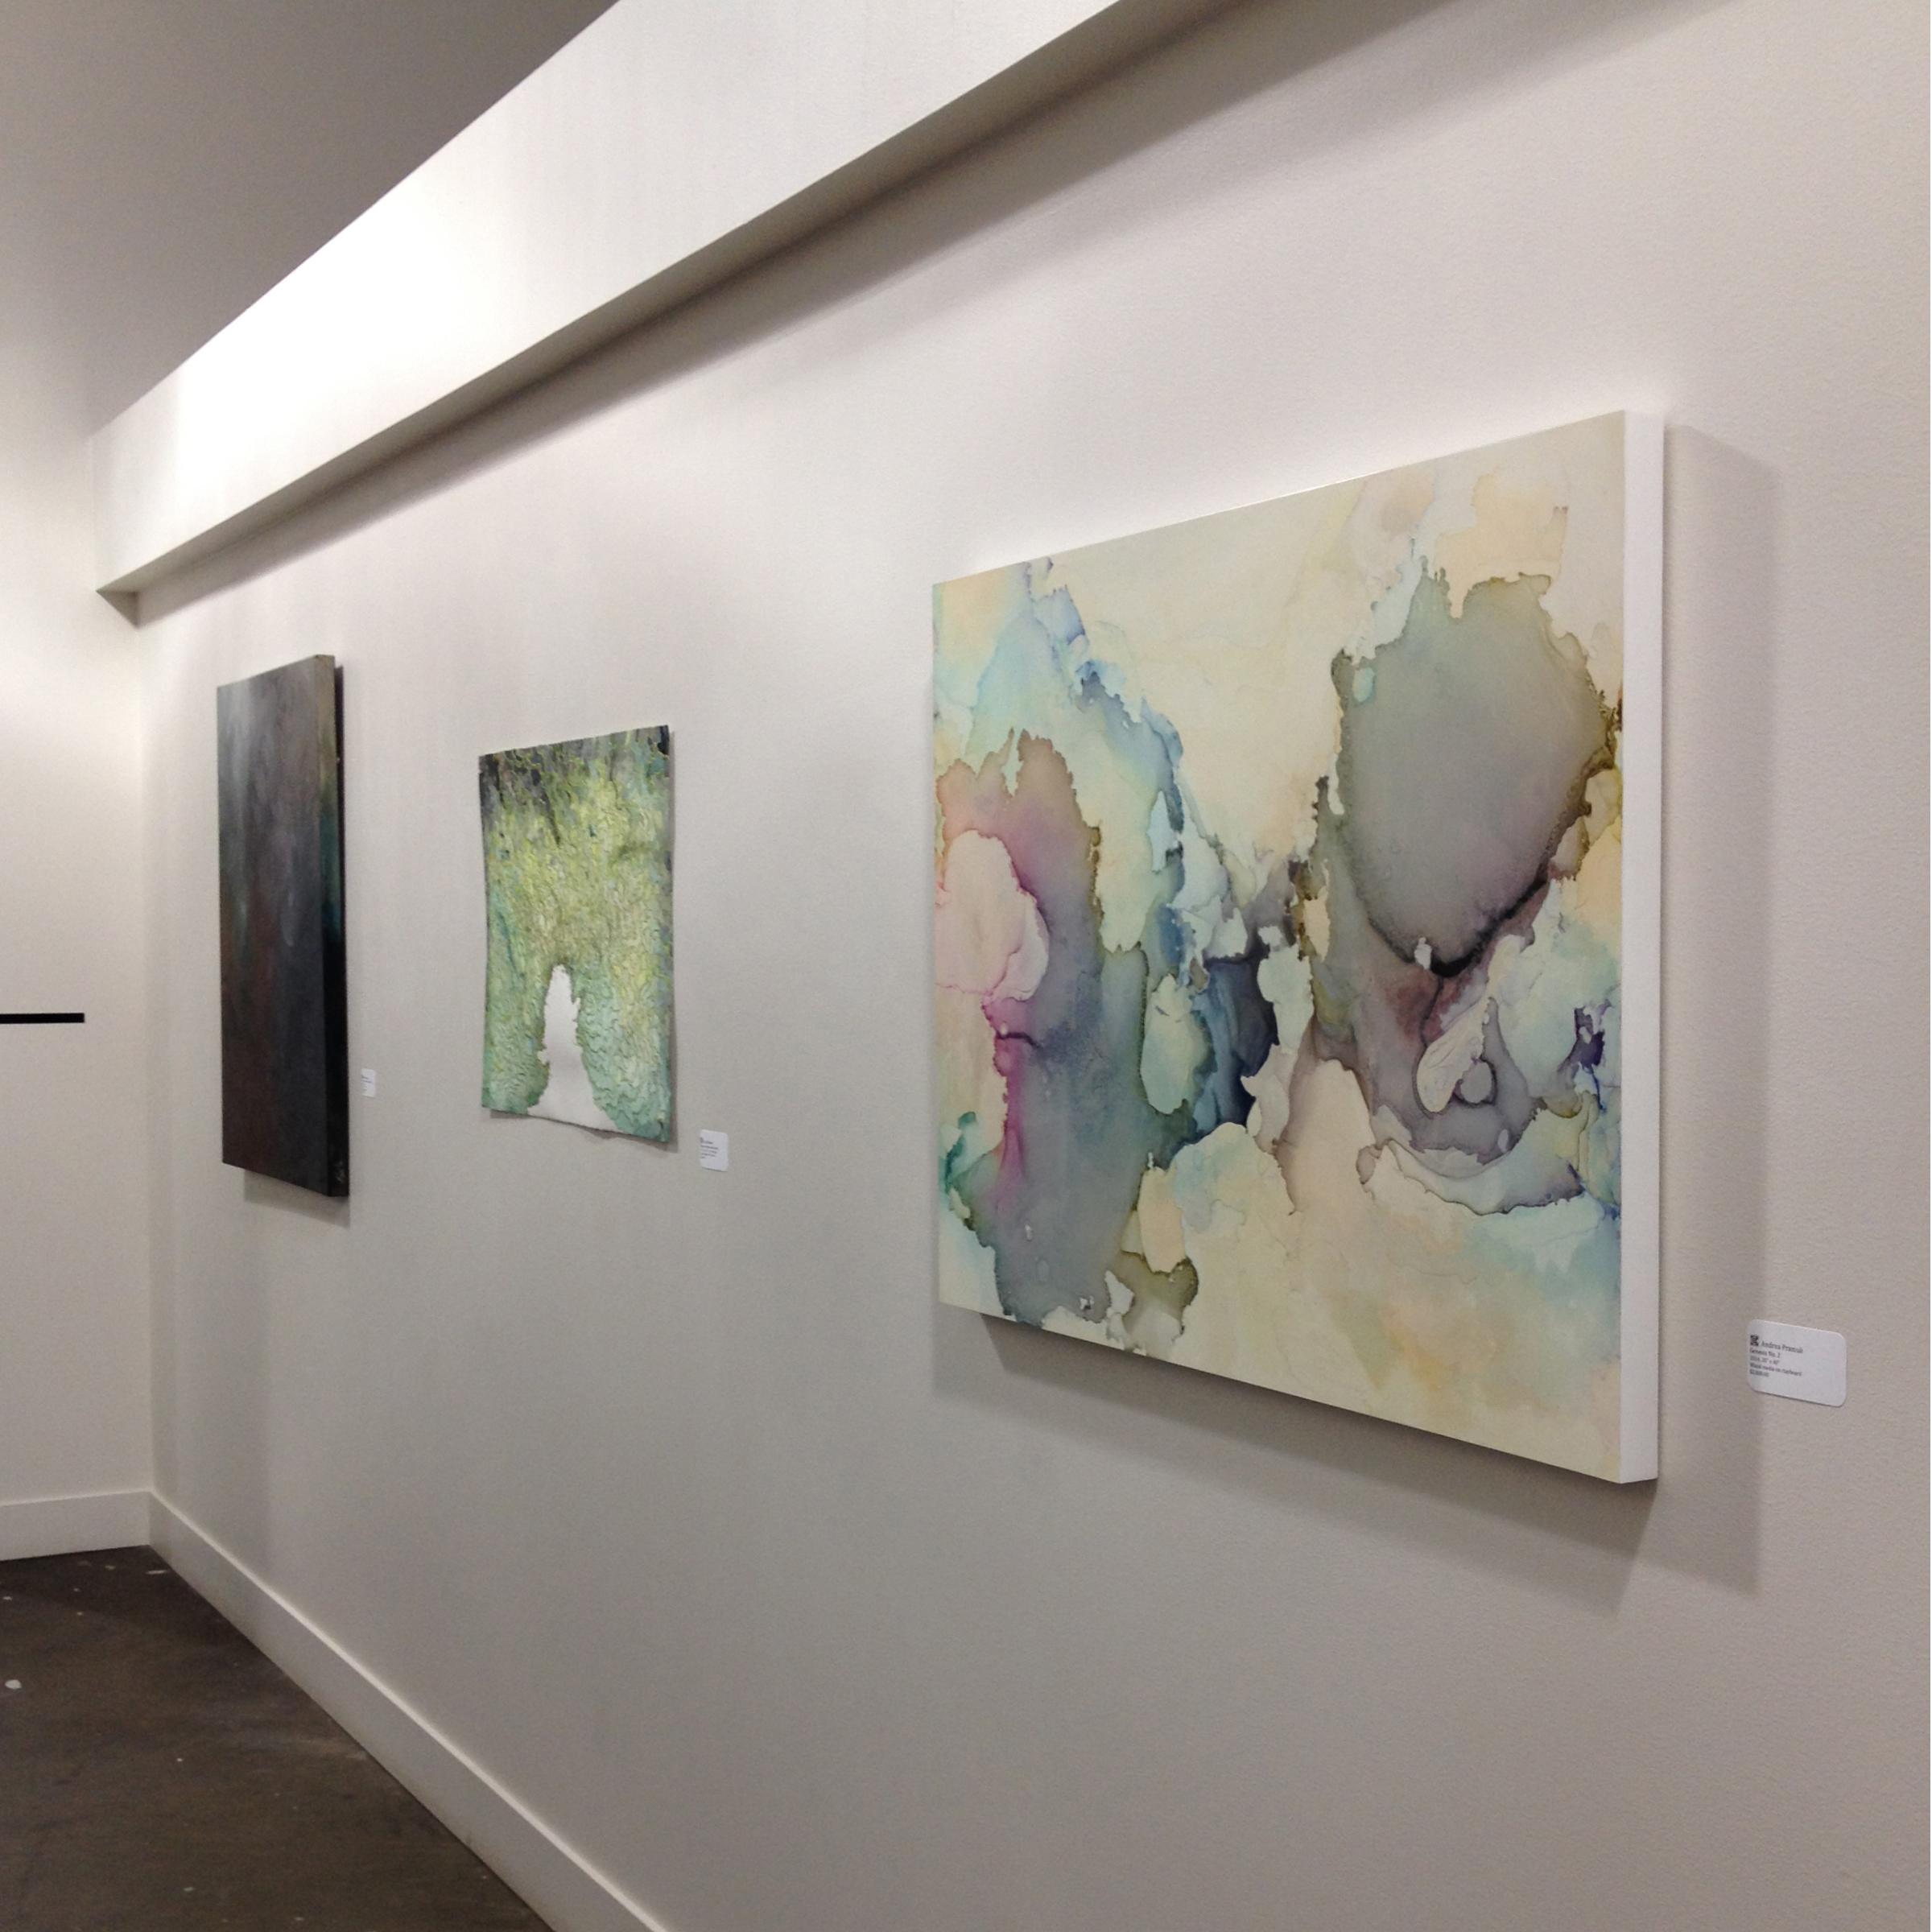 Camiba Art , Austin, TX,  Flow , 2/1/15 – 4/5/15 with artists  Paul Booker  (center),  Nicola Parente  and  Misha Penton  (shown left).  Genesis II  (right)